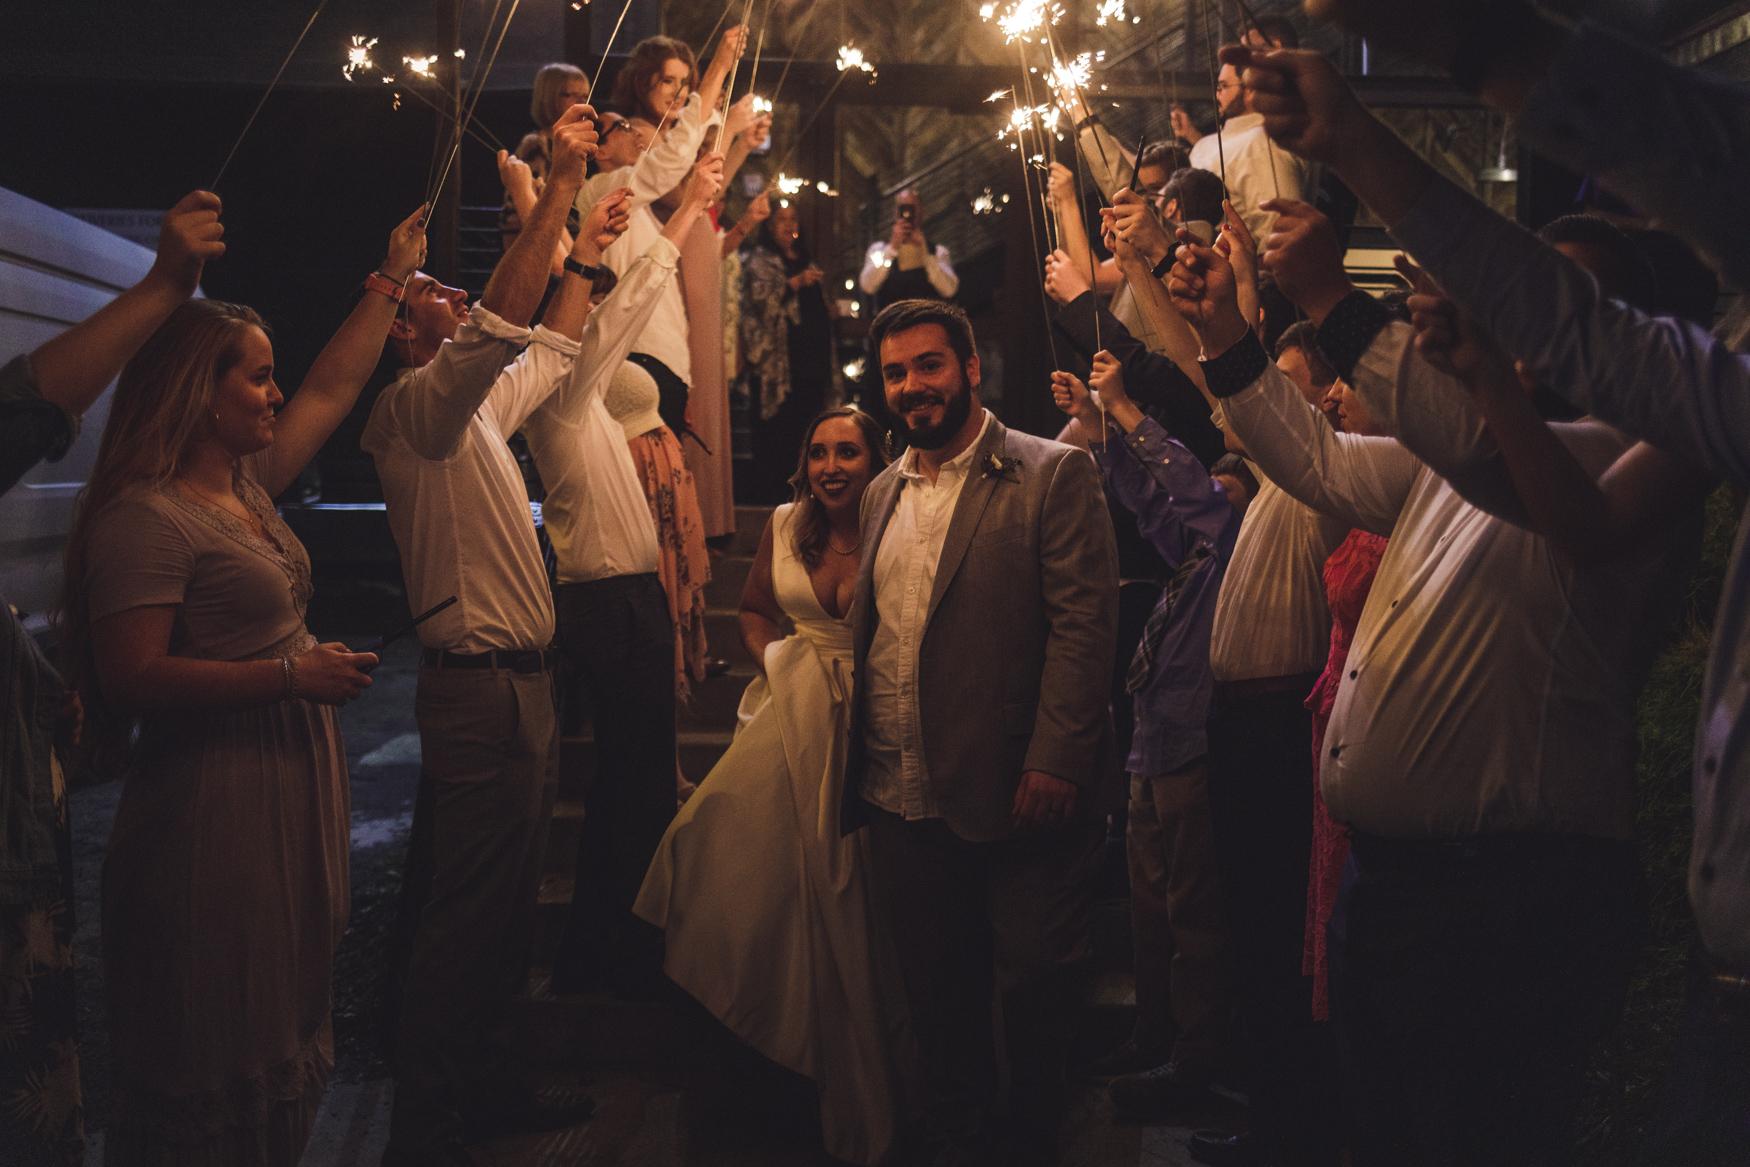 charlotte wedding photographer, asheville wedding, highland brewing wedding, destination wedding photographer, italian countryside wedding, milan wedding photographer,  north carolina wedding photographer,